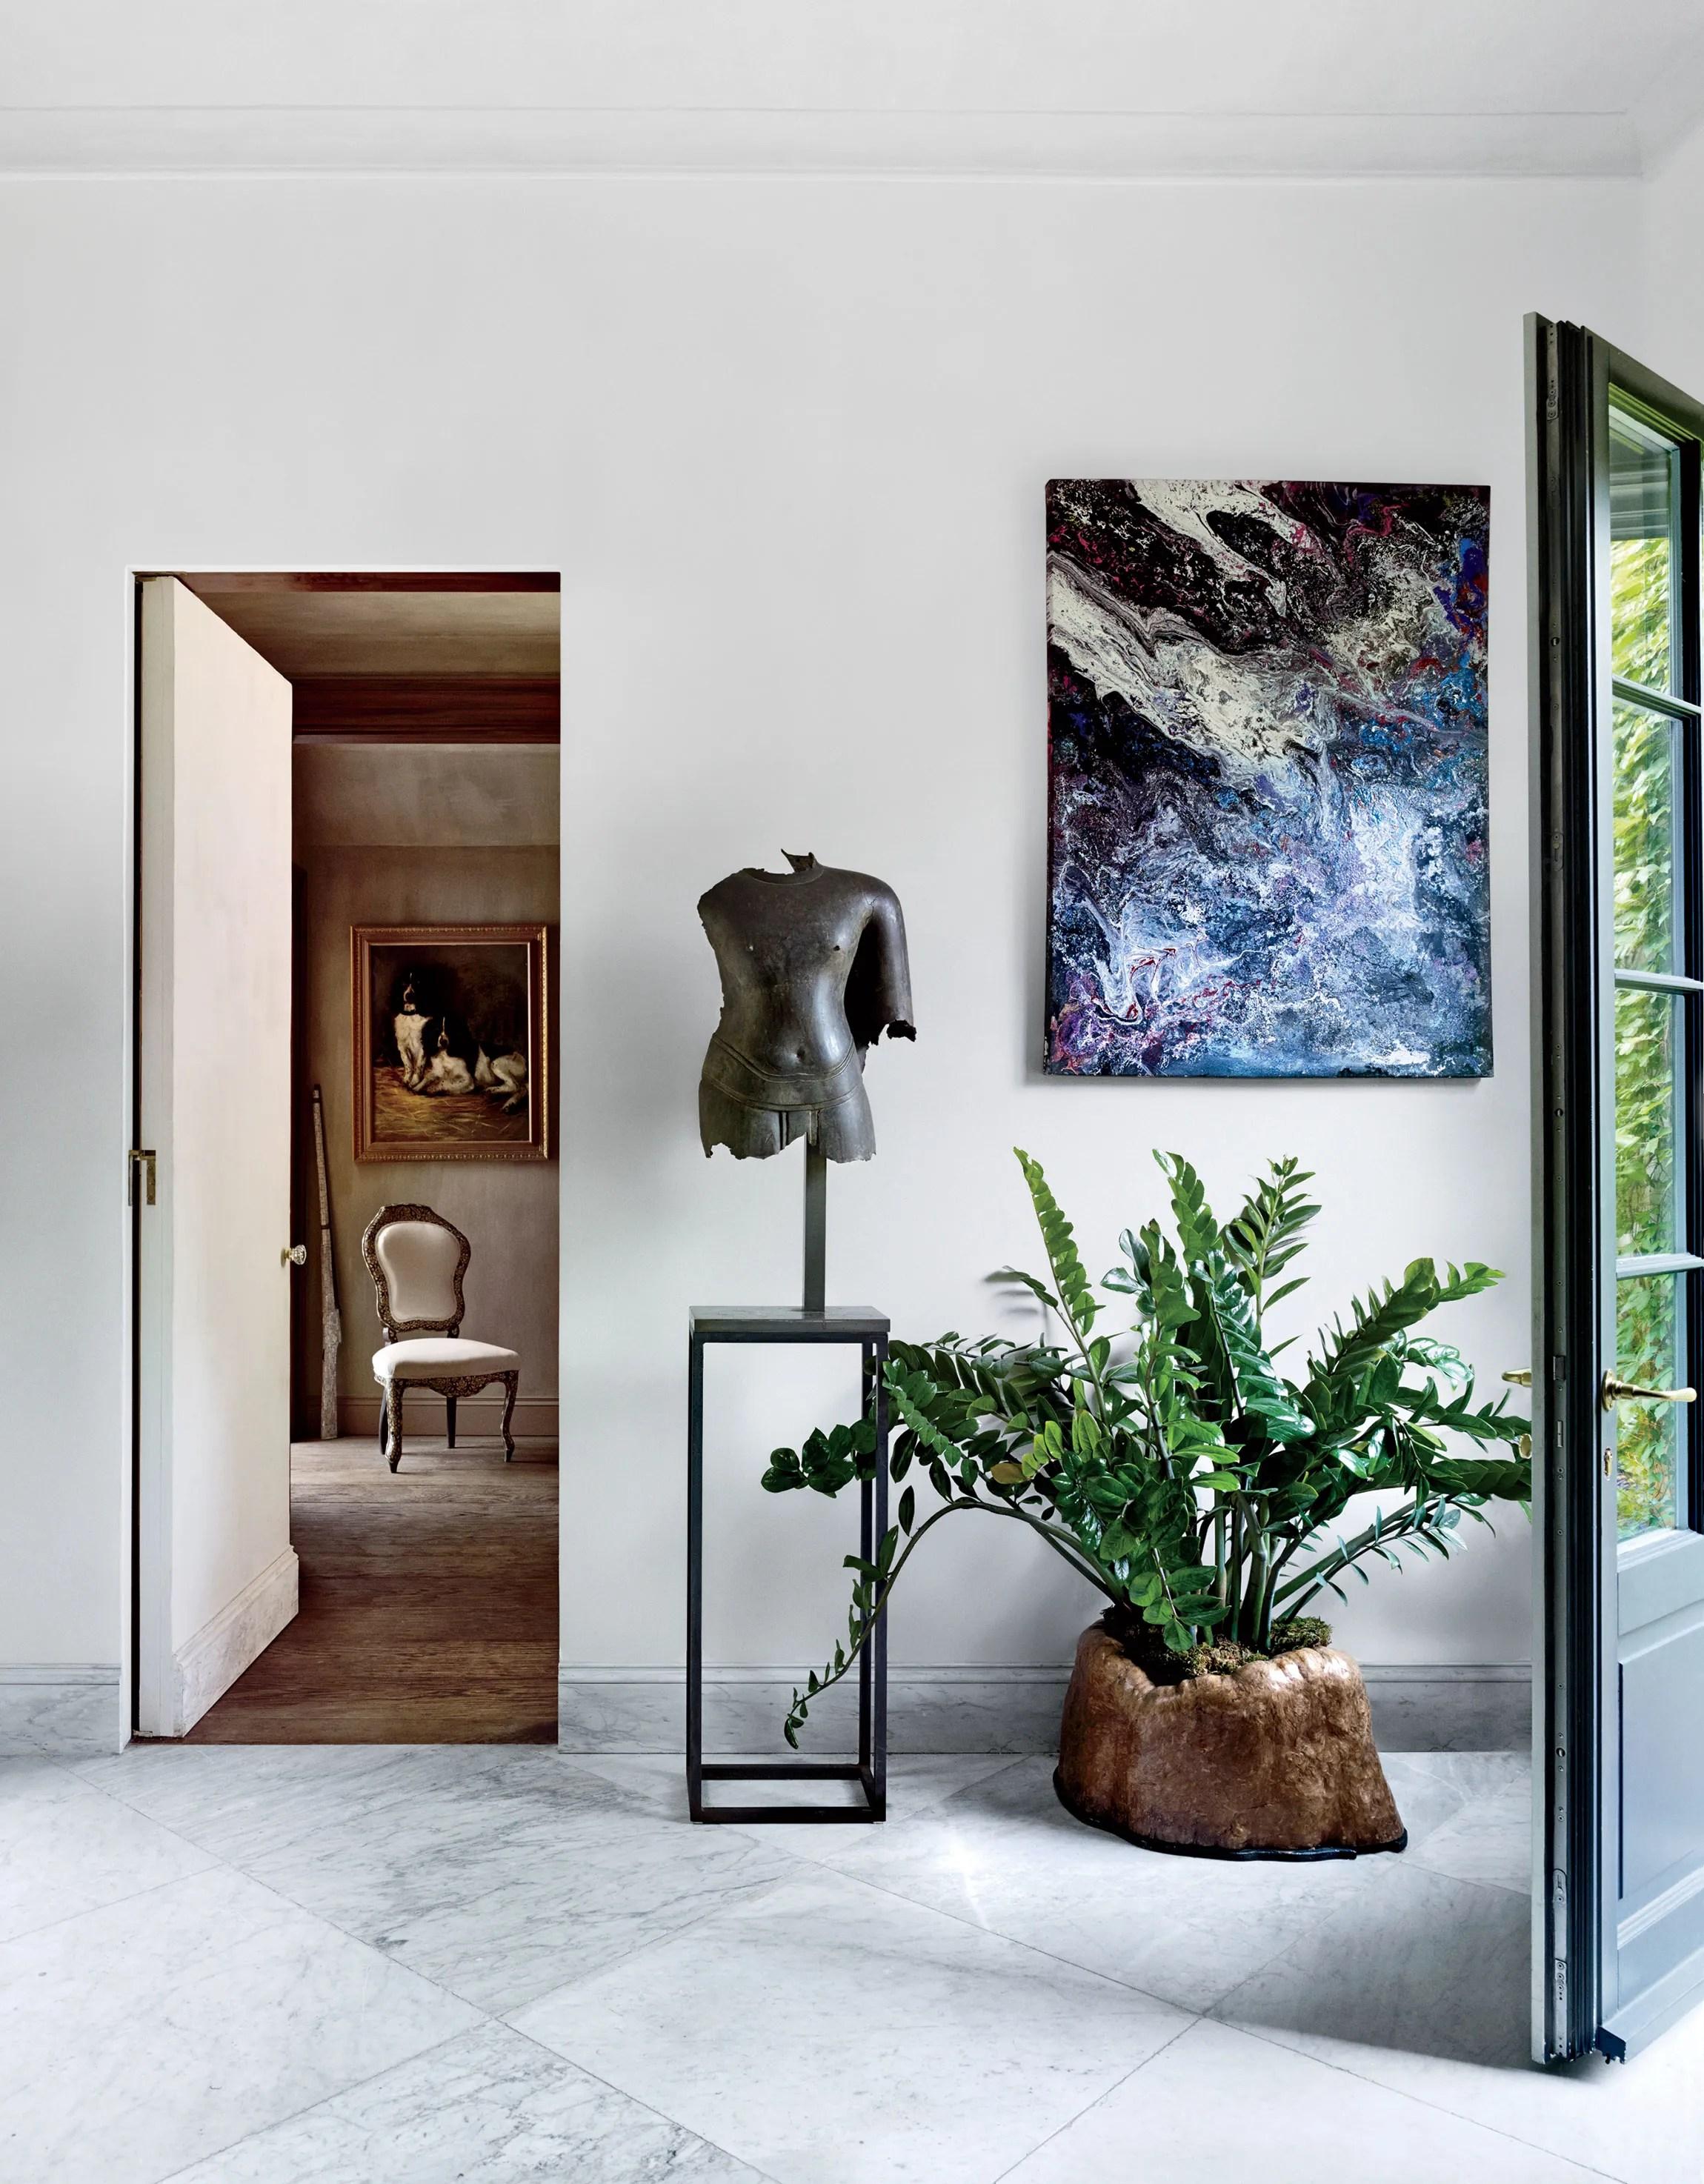 2017 AD100 Axel Vervoordt  Architectural Digest